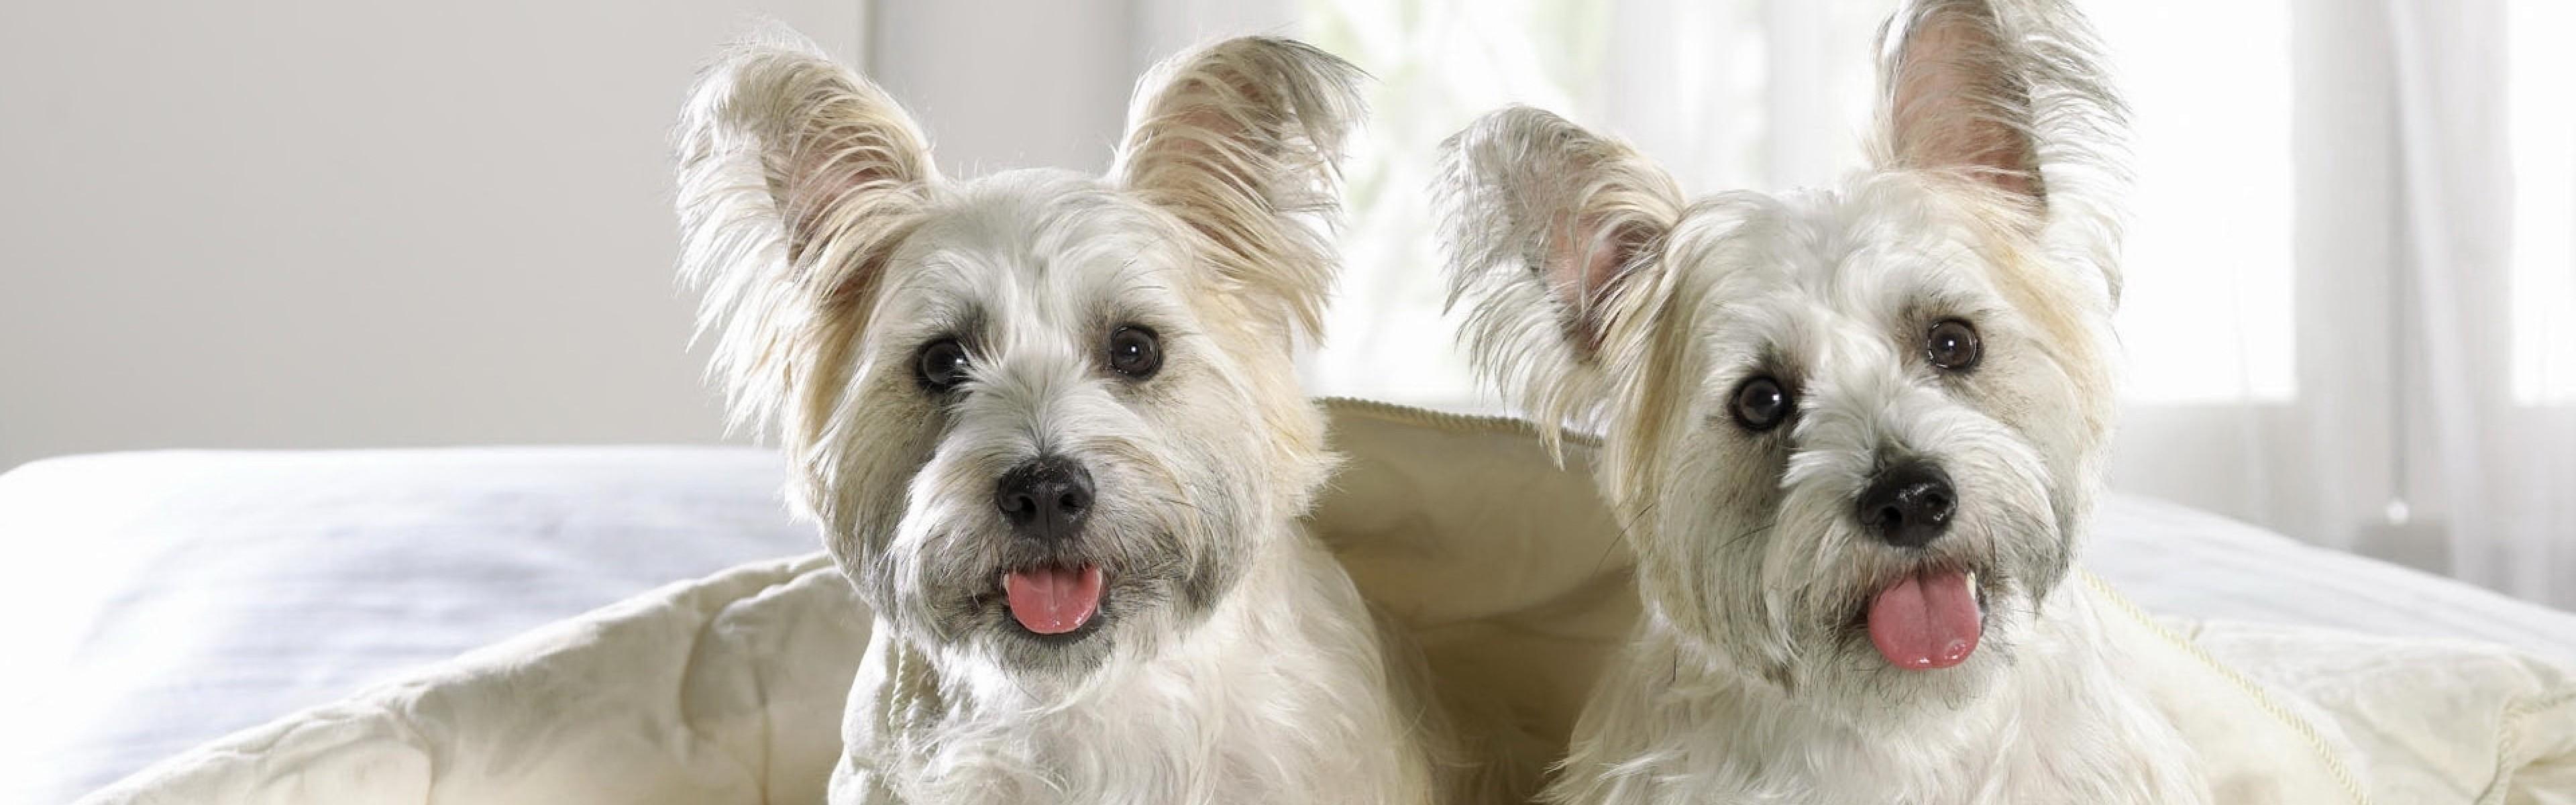 Westie Dog Wallpaper (62+ images)